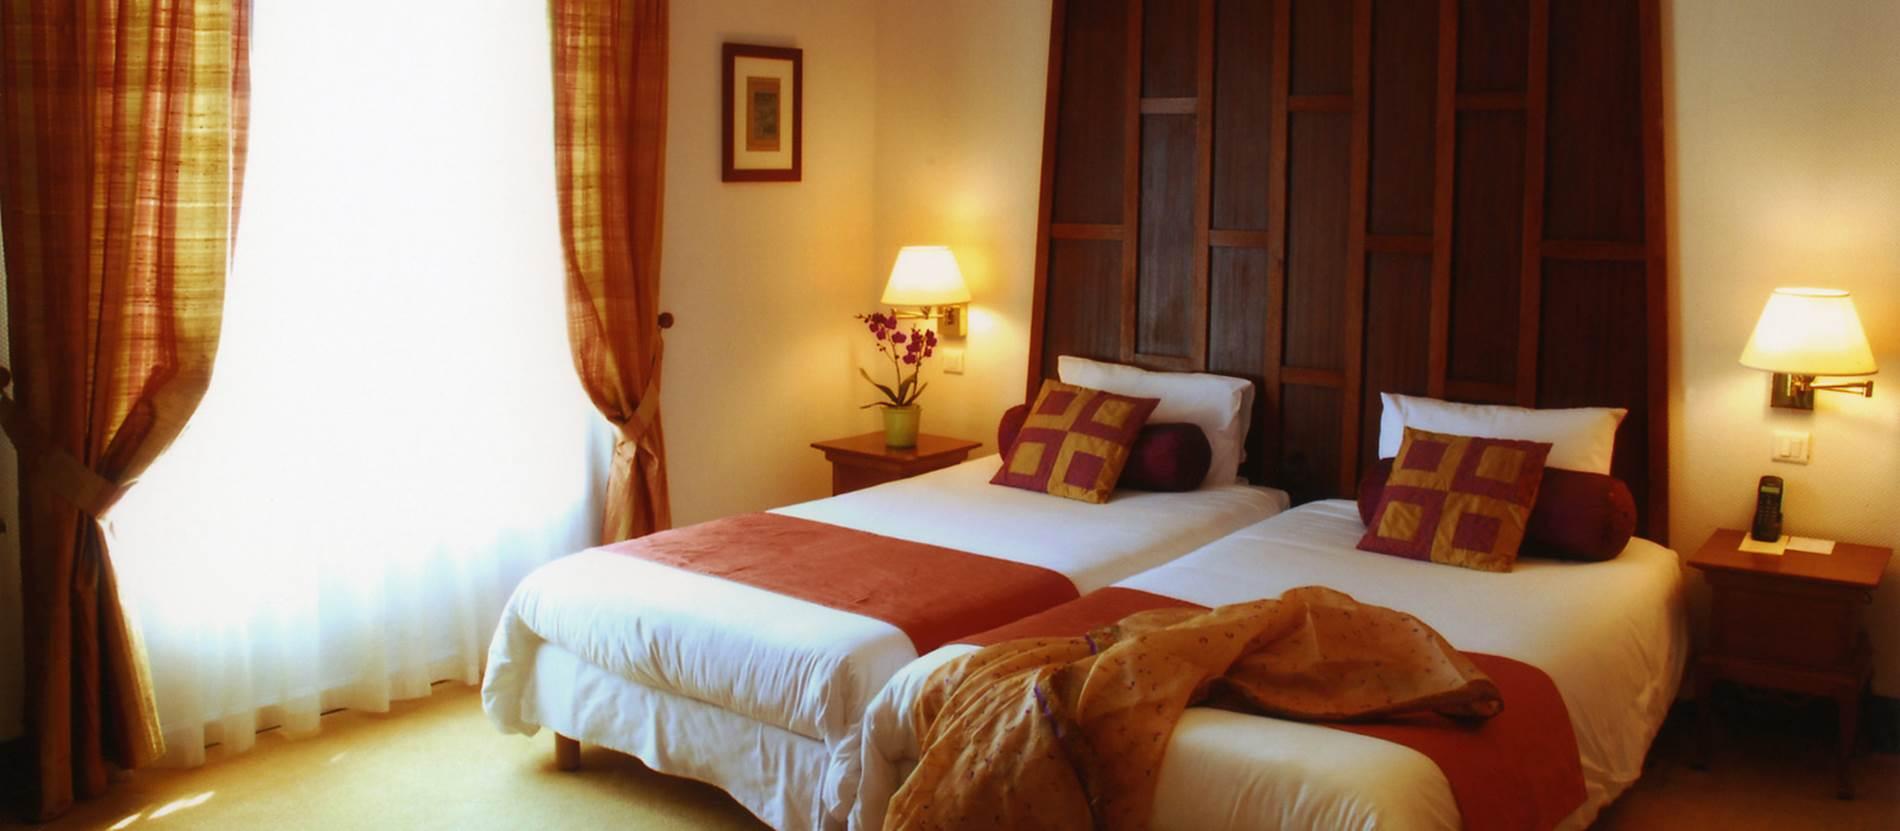 chambre Deluxe 25m2 jardin © Hotel Villa Kerasy Hotel Spa -Vannes